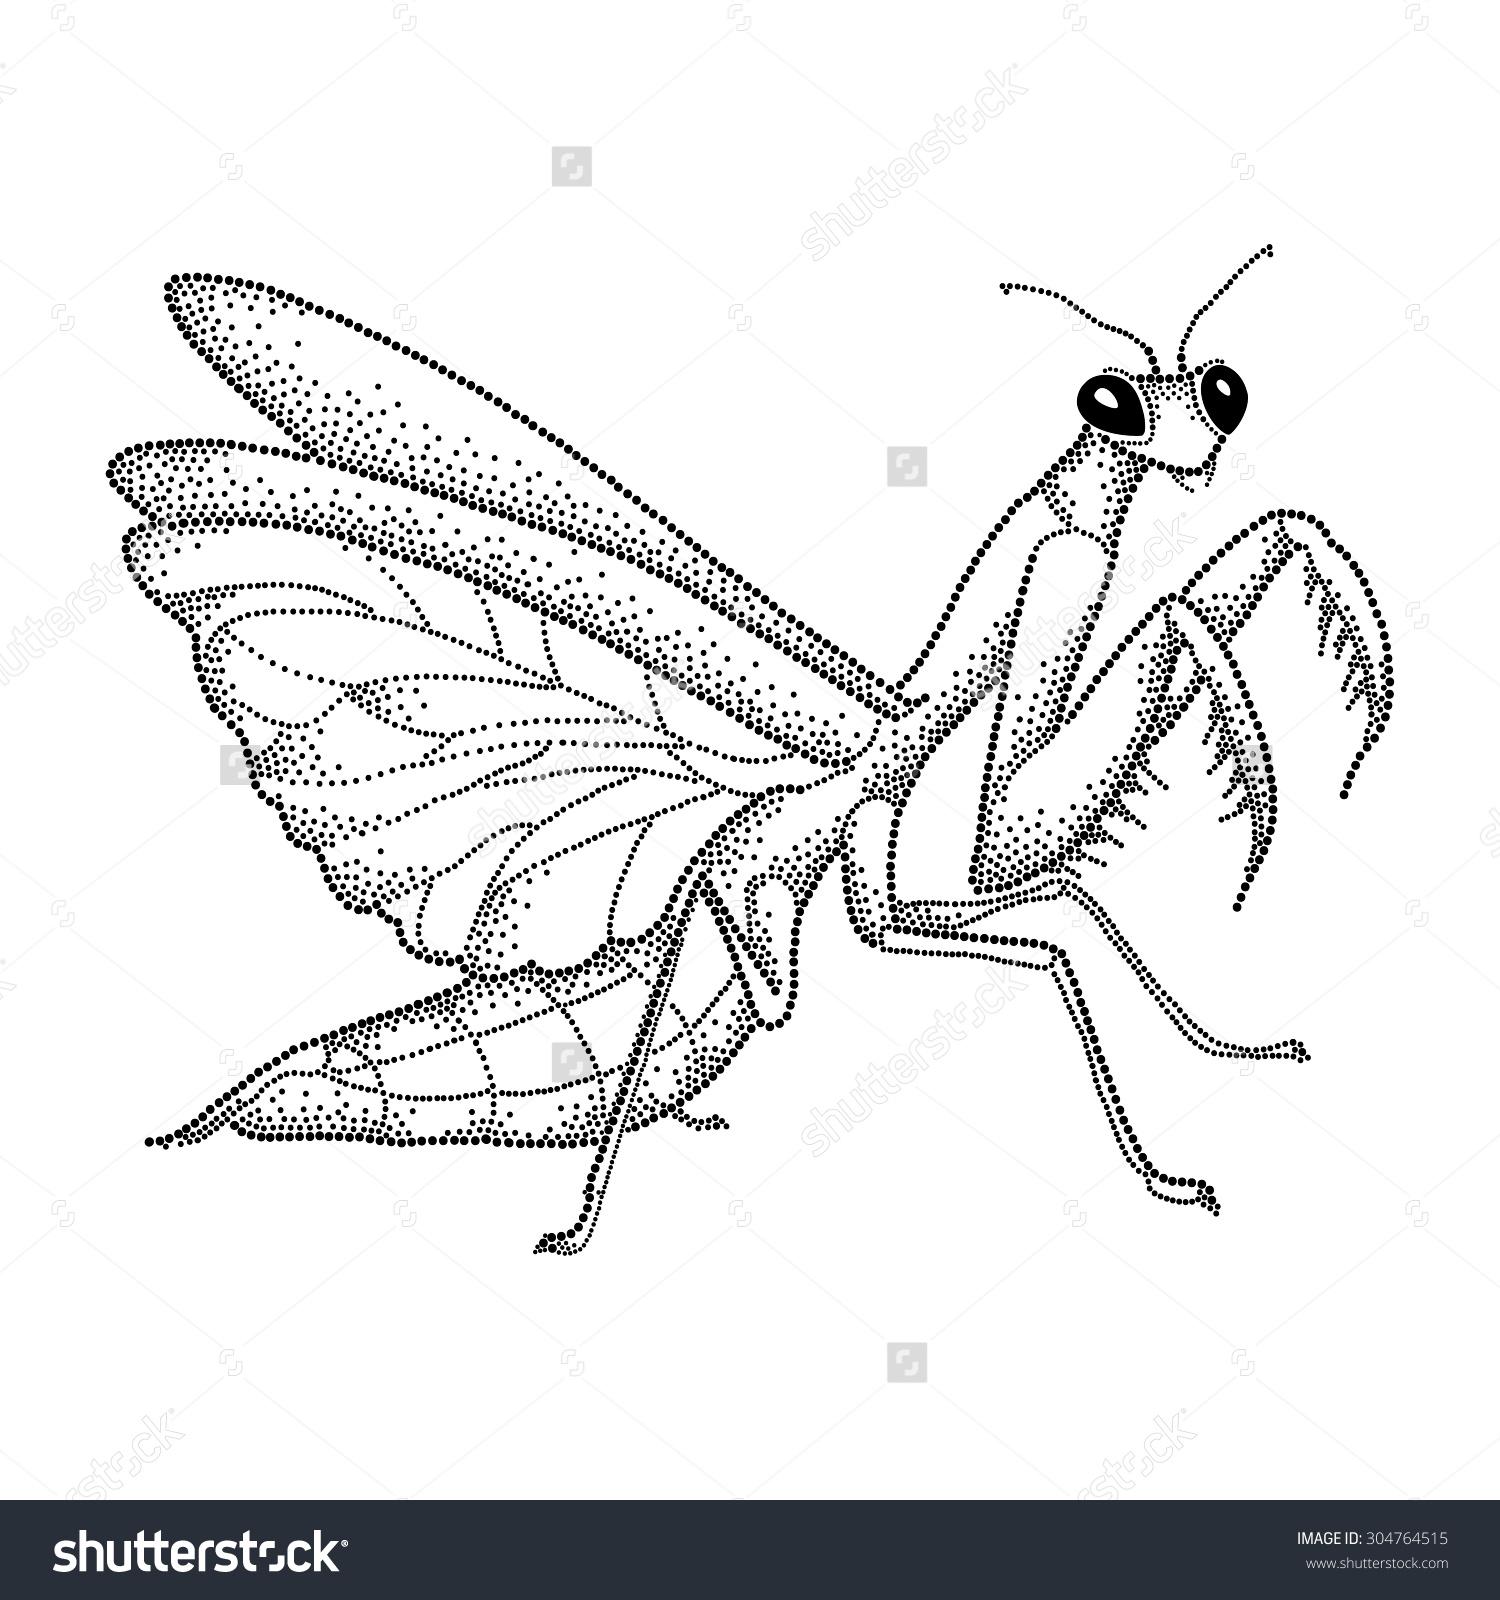 Dotted Black Mantis Religiosa Praying Mantis Stock Vector.